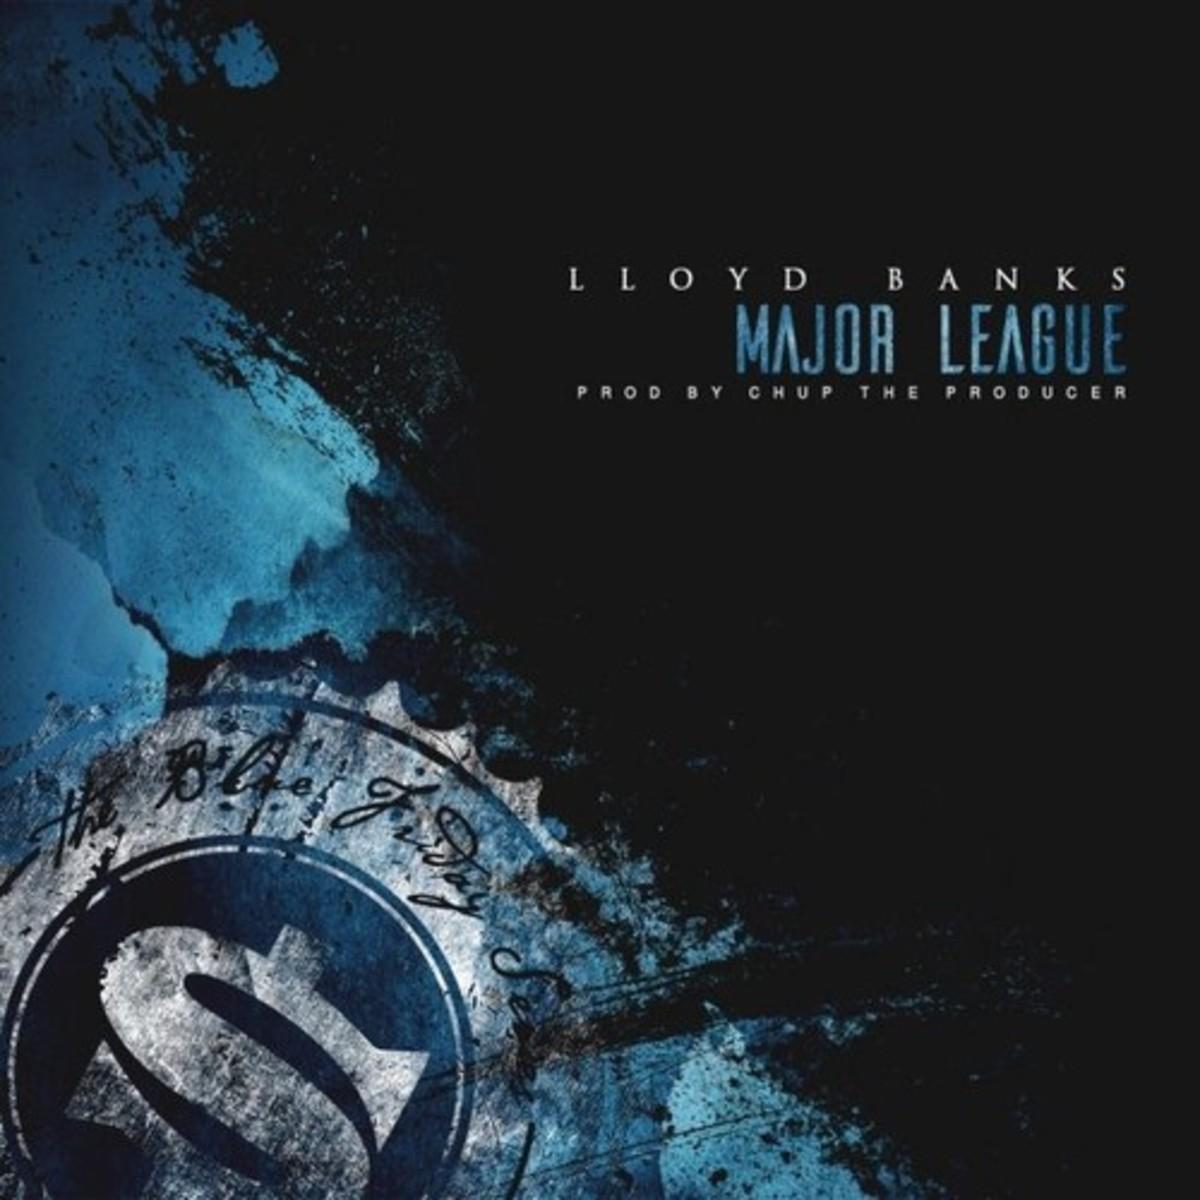 lloyd-banks-major-league.jpg